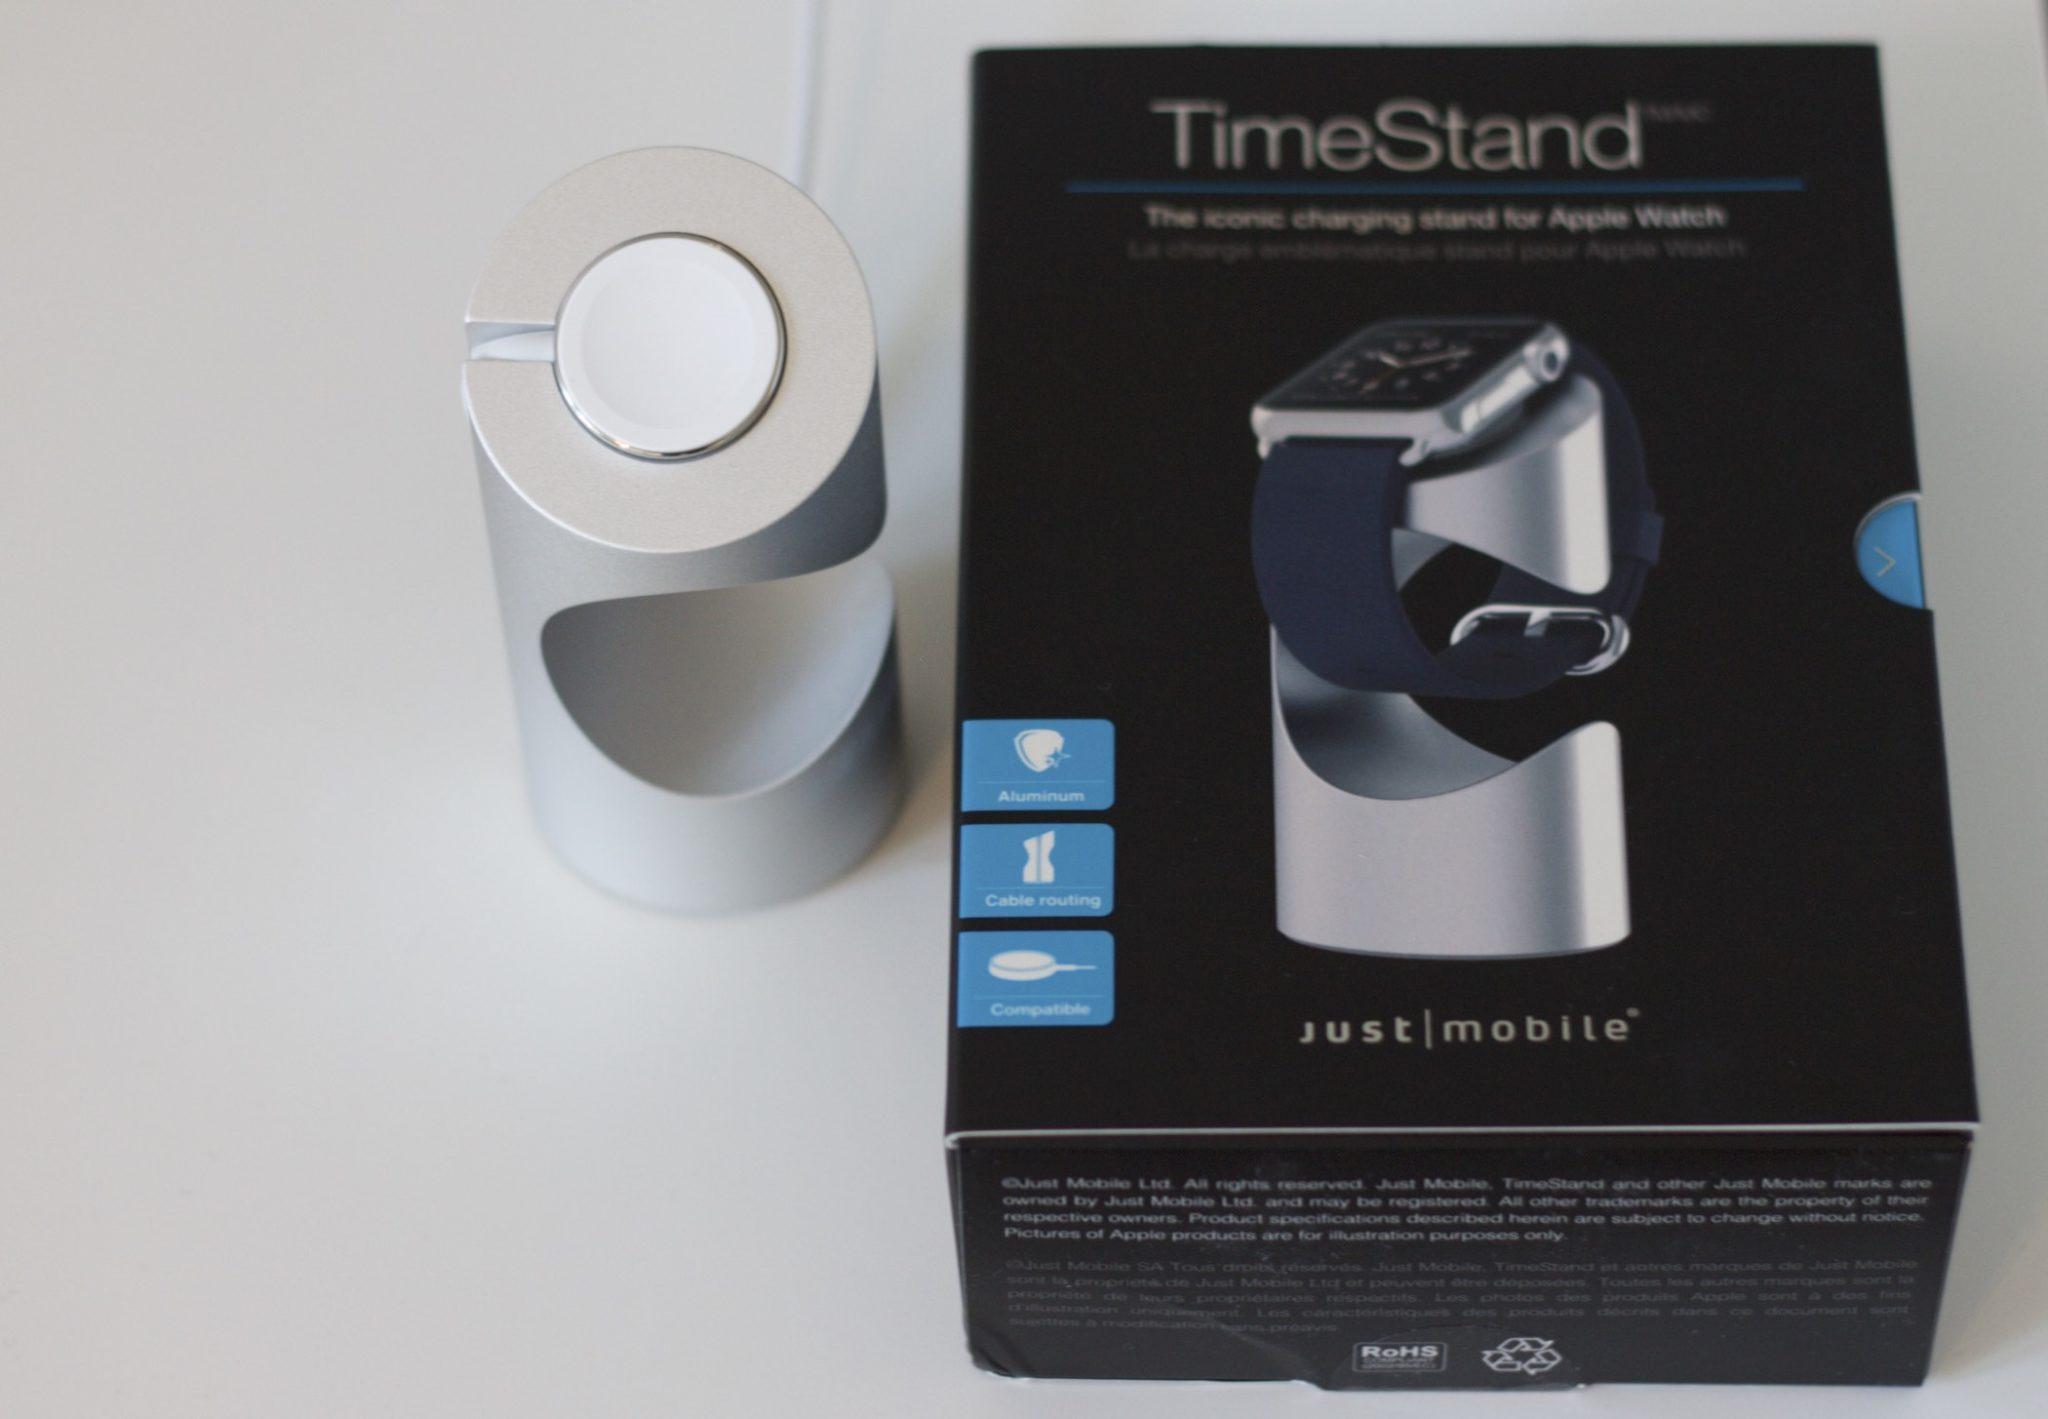 TimeStand